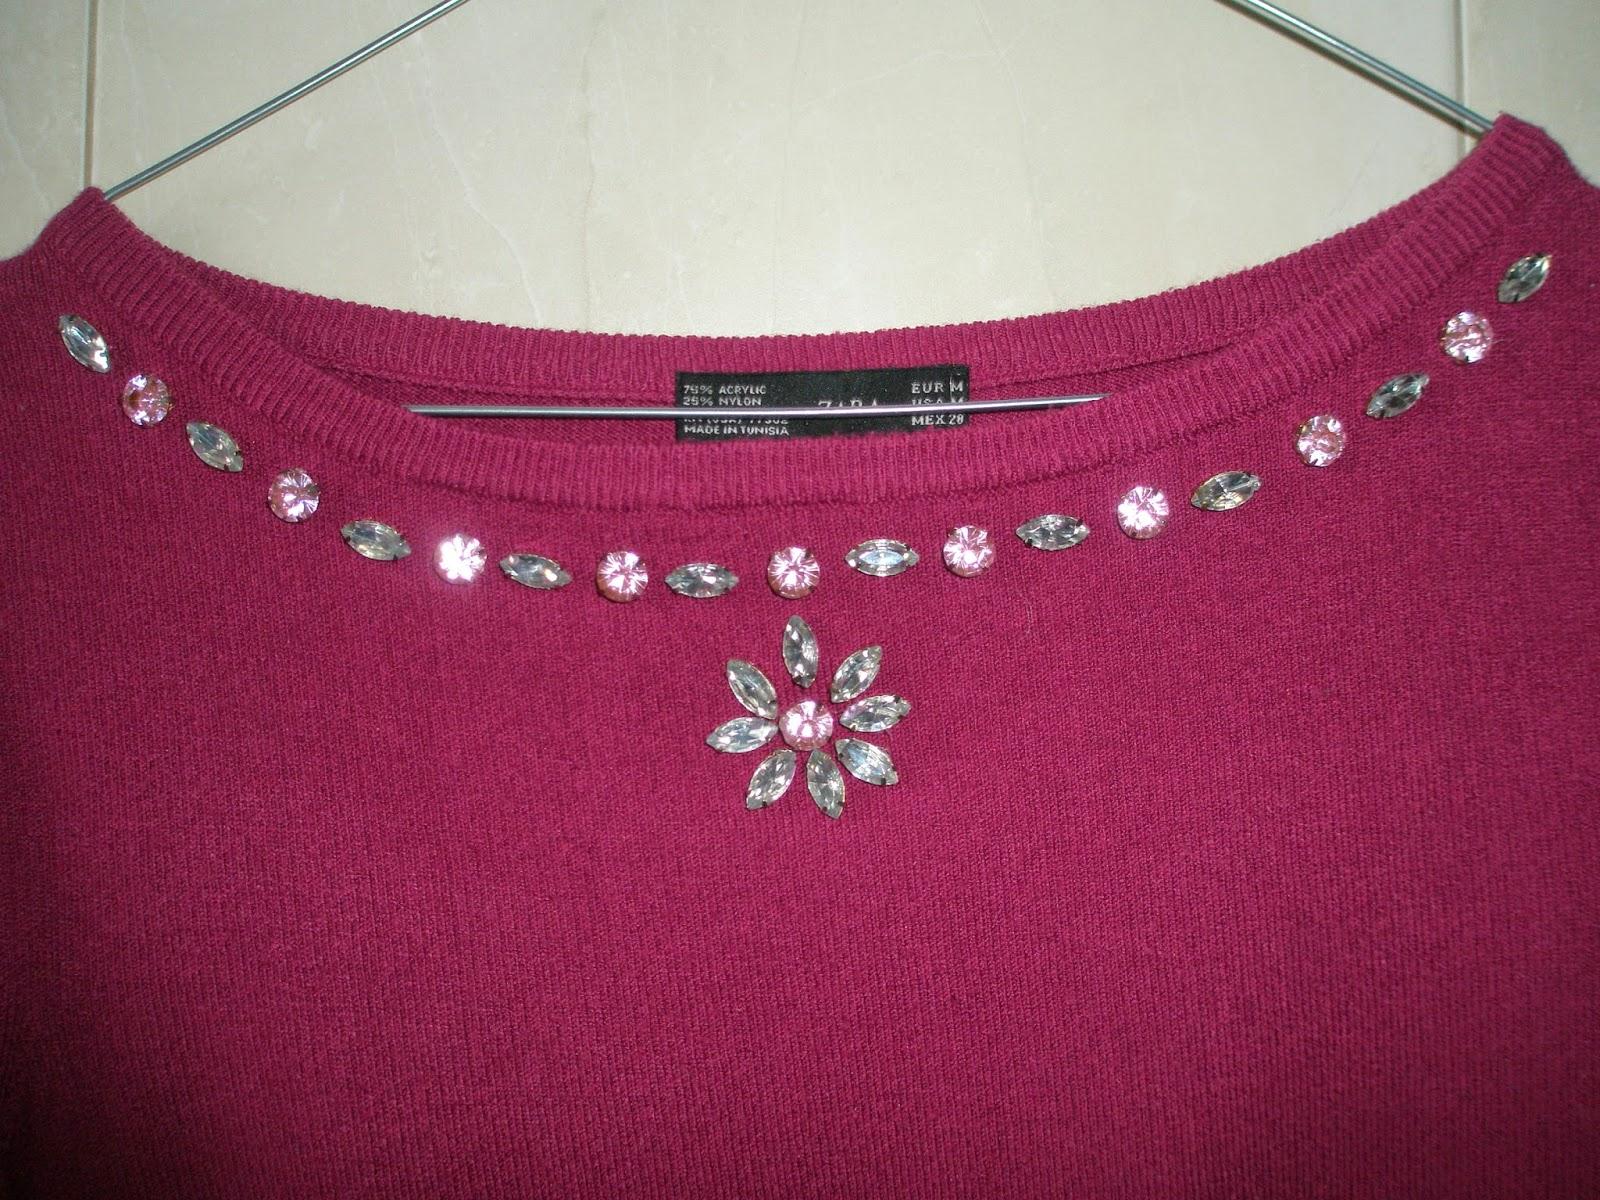 Customizando jersey con cristales